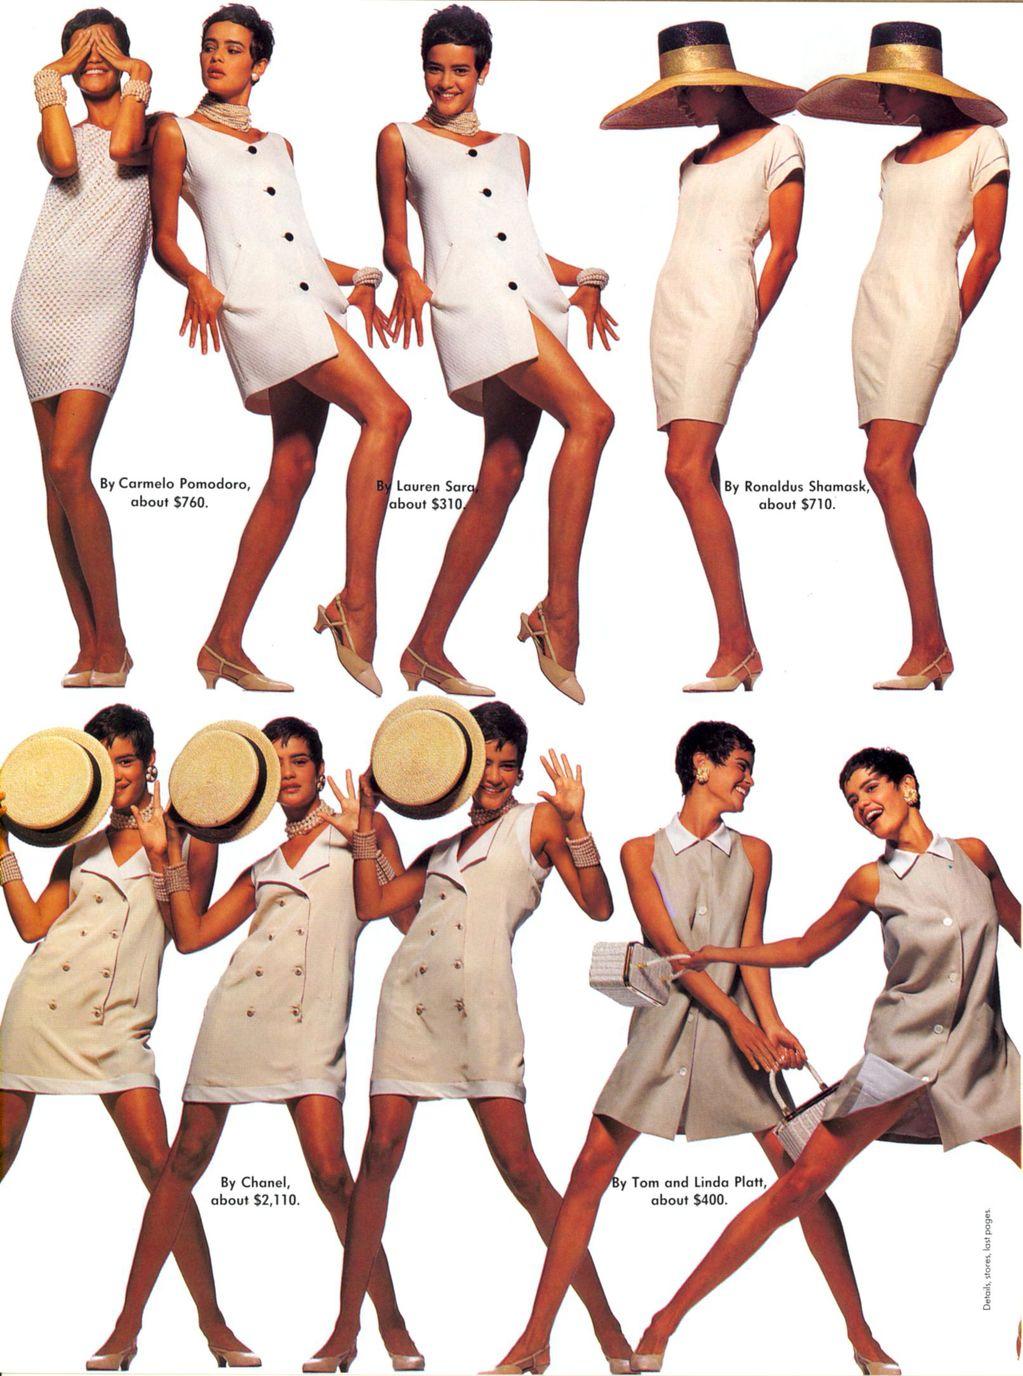 Vogue January 1991 | Great Buys - Dress Rehearsal 07.jpg